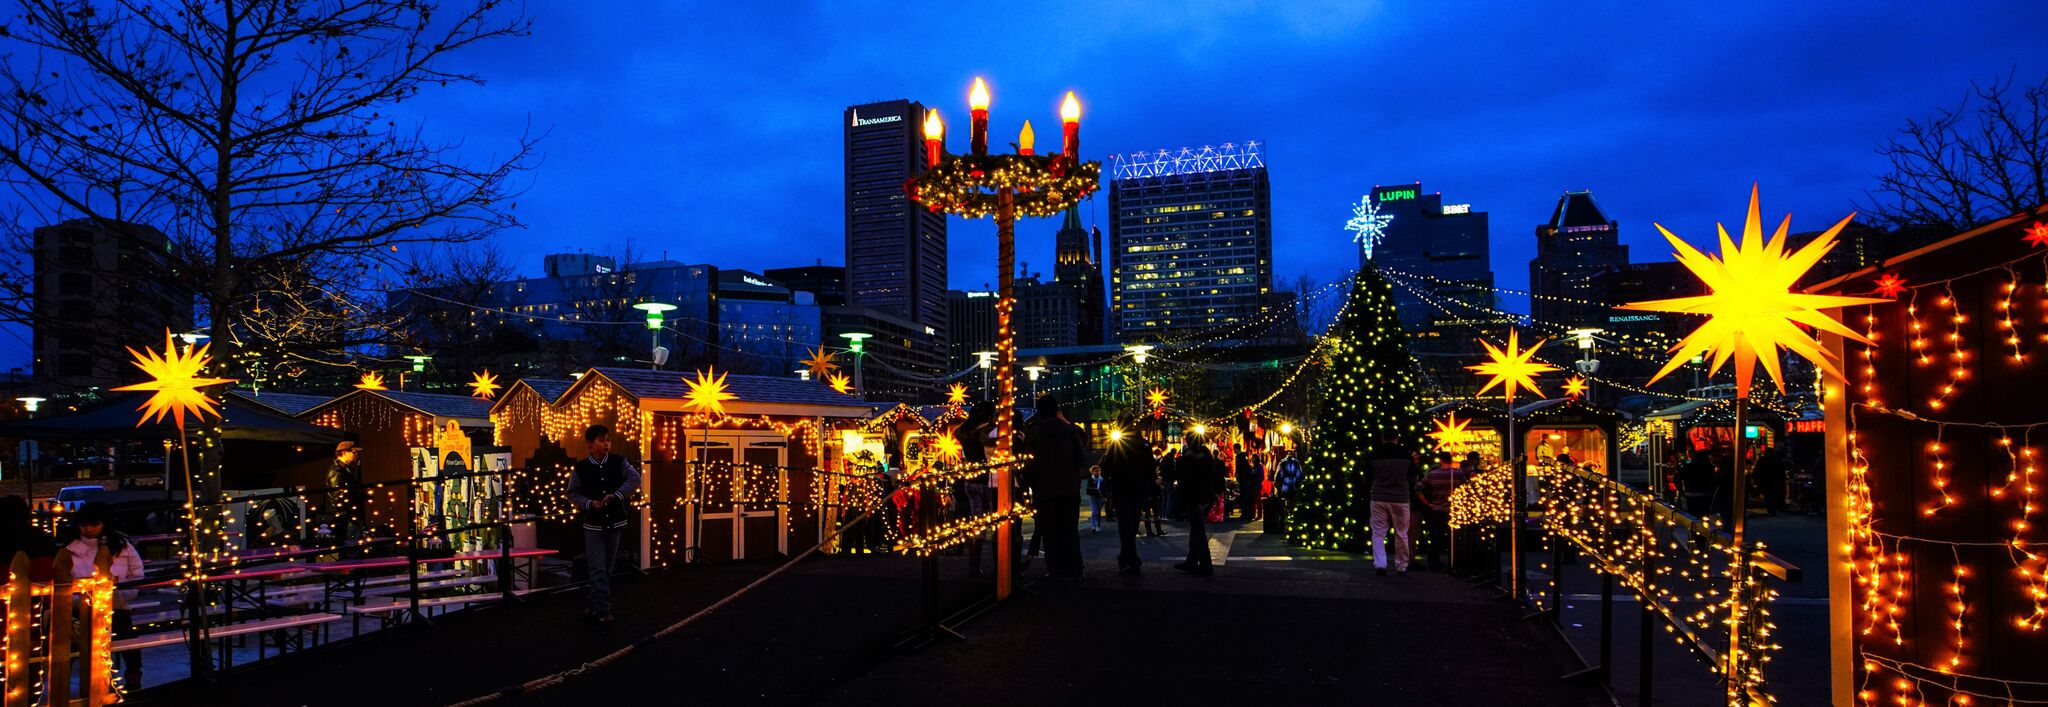 Baltimore Christmas Village Wide Shot